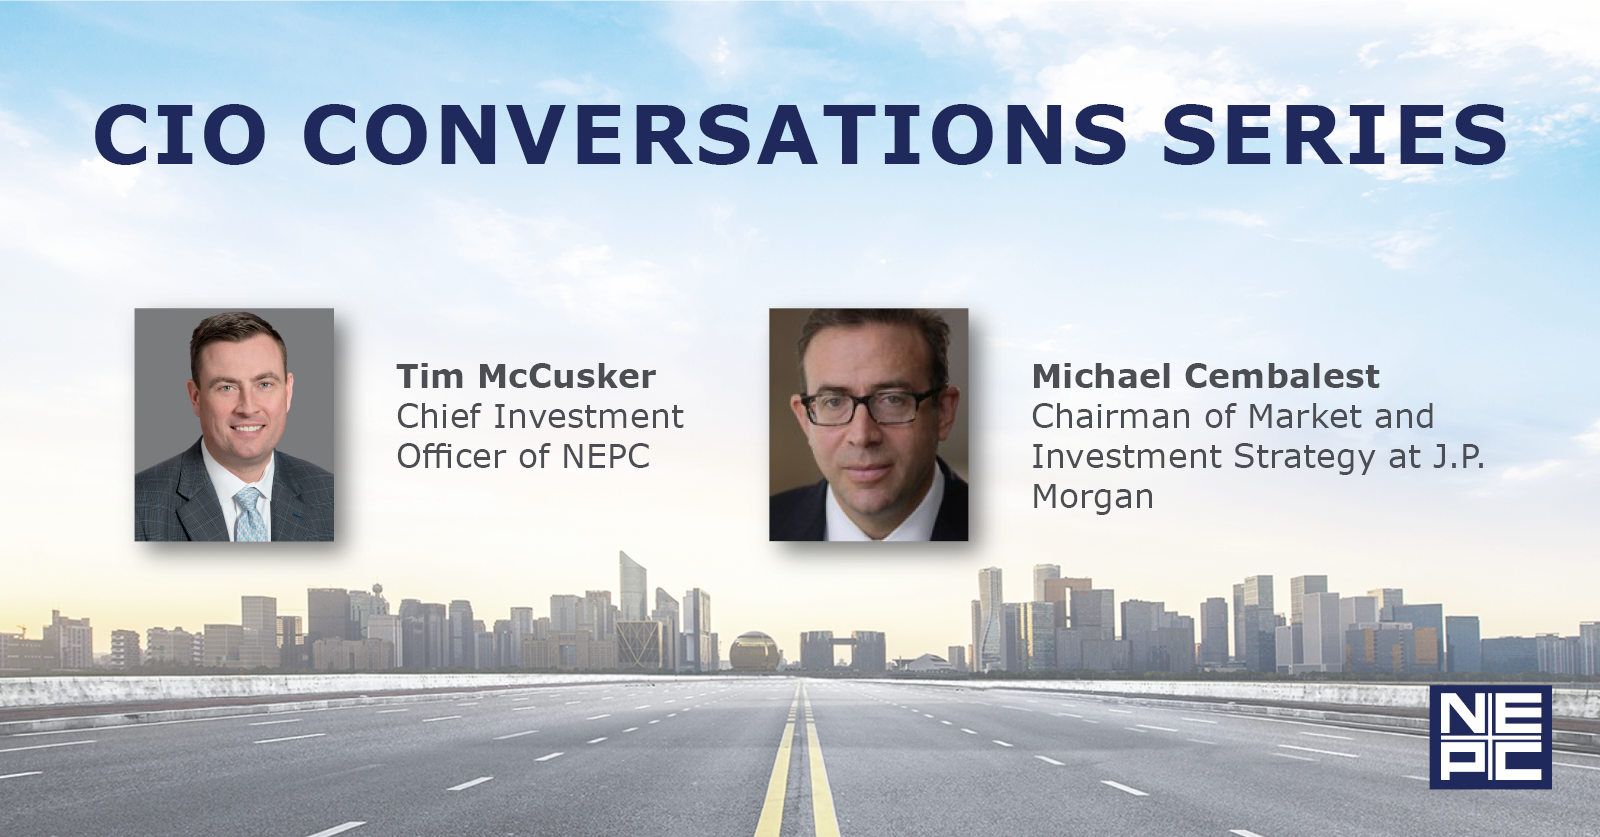 CIO Conversations Michael Cembalest